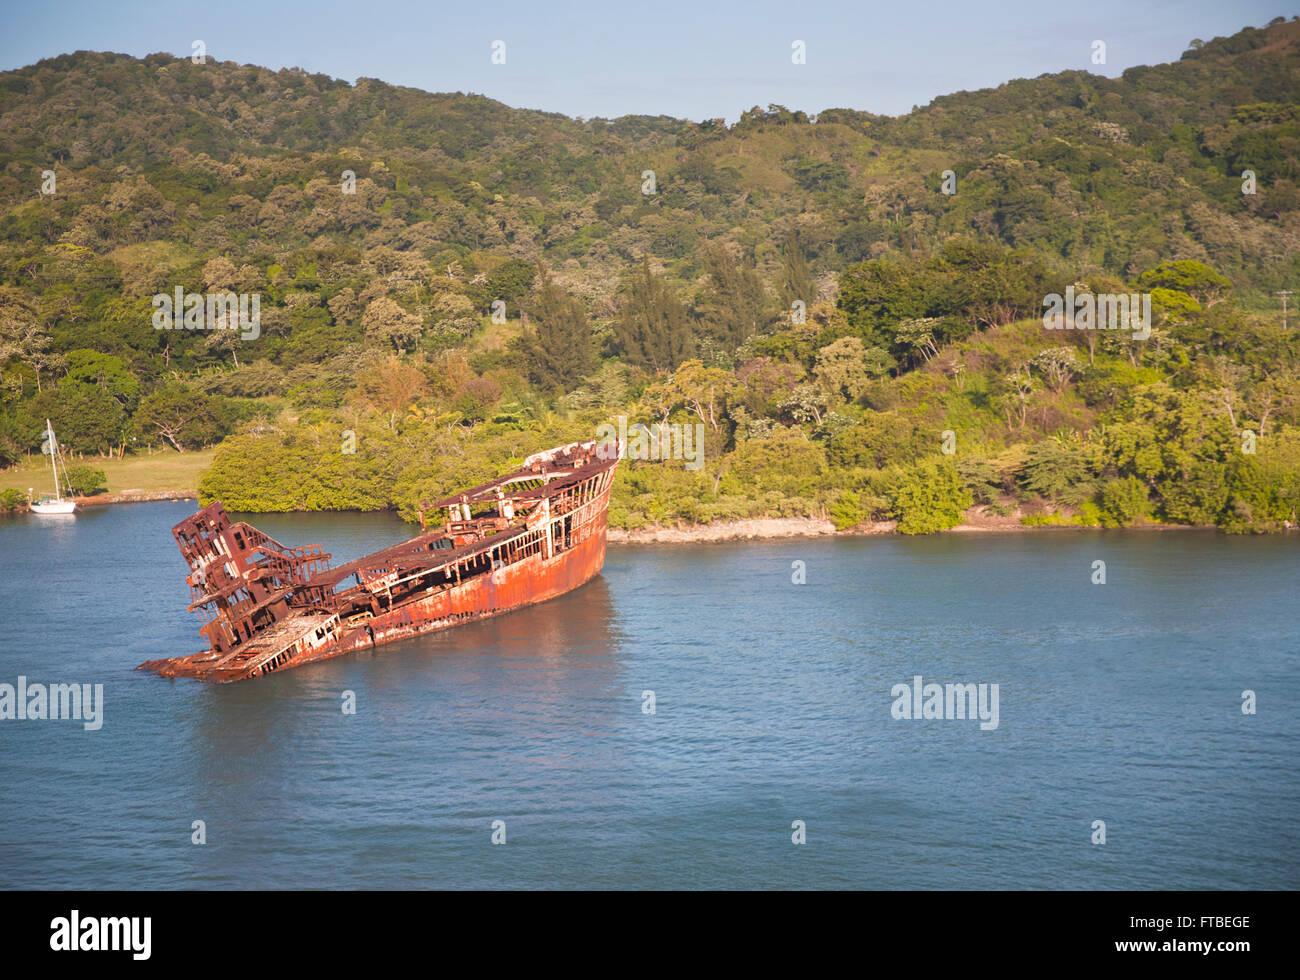 Sunken ship sitting in Mahogany Bar in Roatán, Honduras with the islands lush vegetation covering the hills - Stock Image